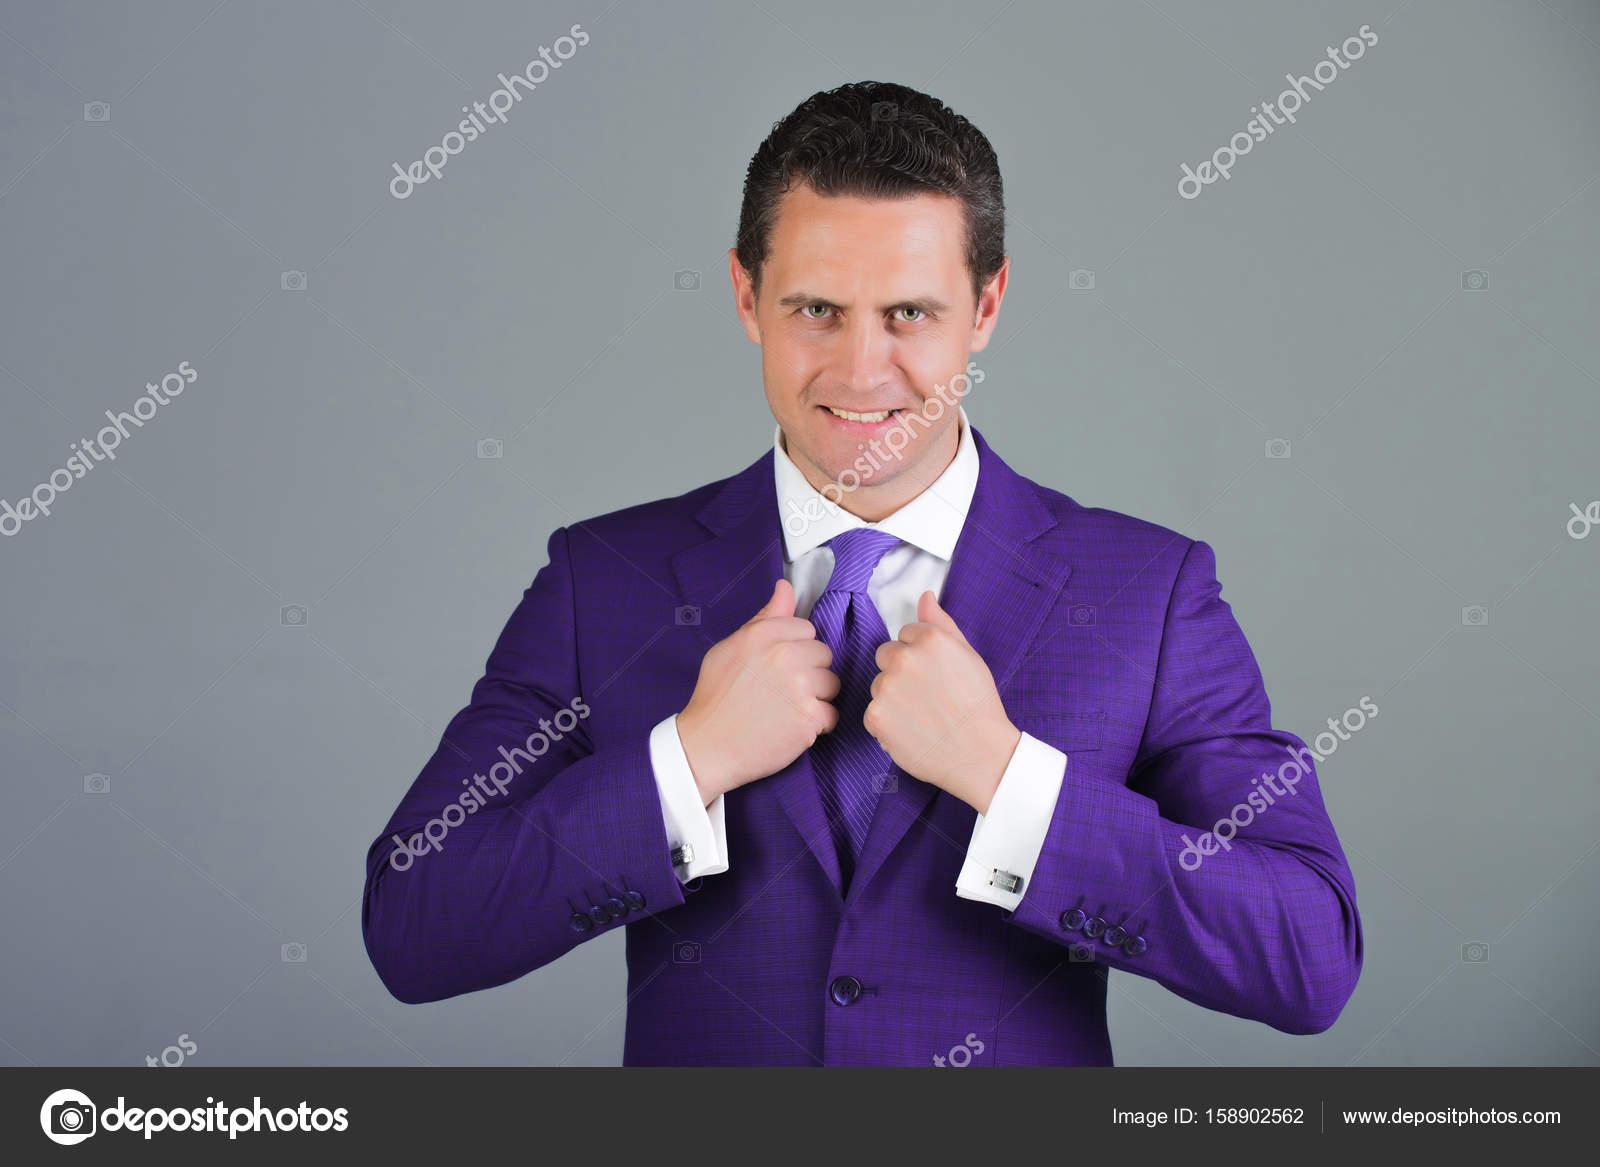 In Giacca Viola Tenuta Formale qwBxtw Di Elegante Collare Uomo rwaqtpfr